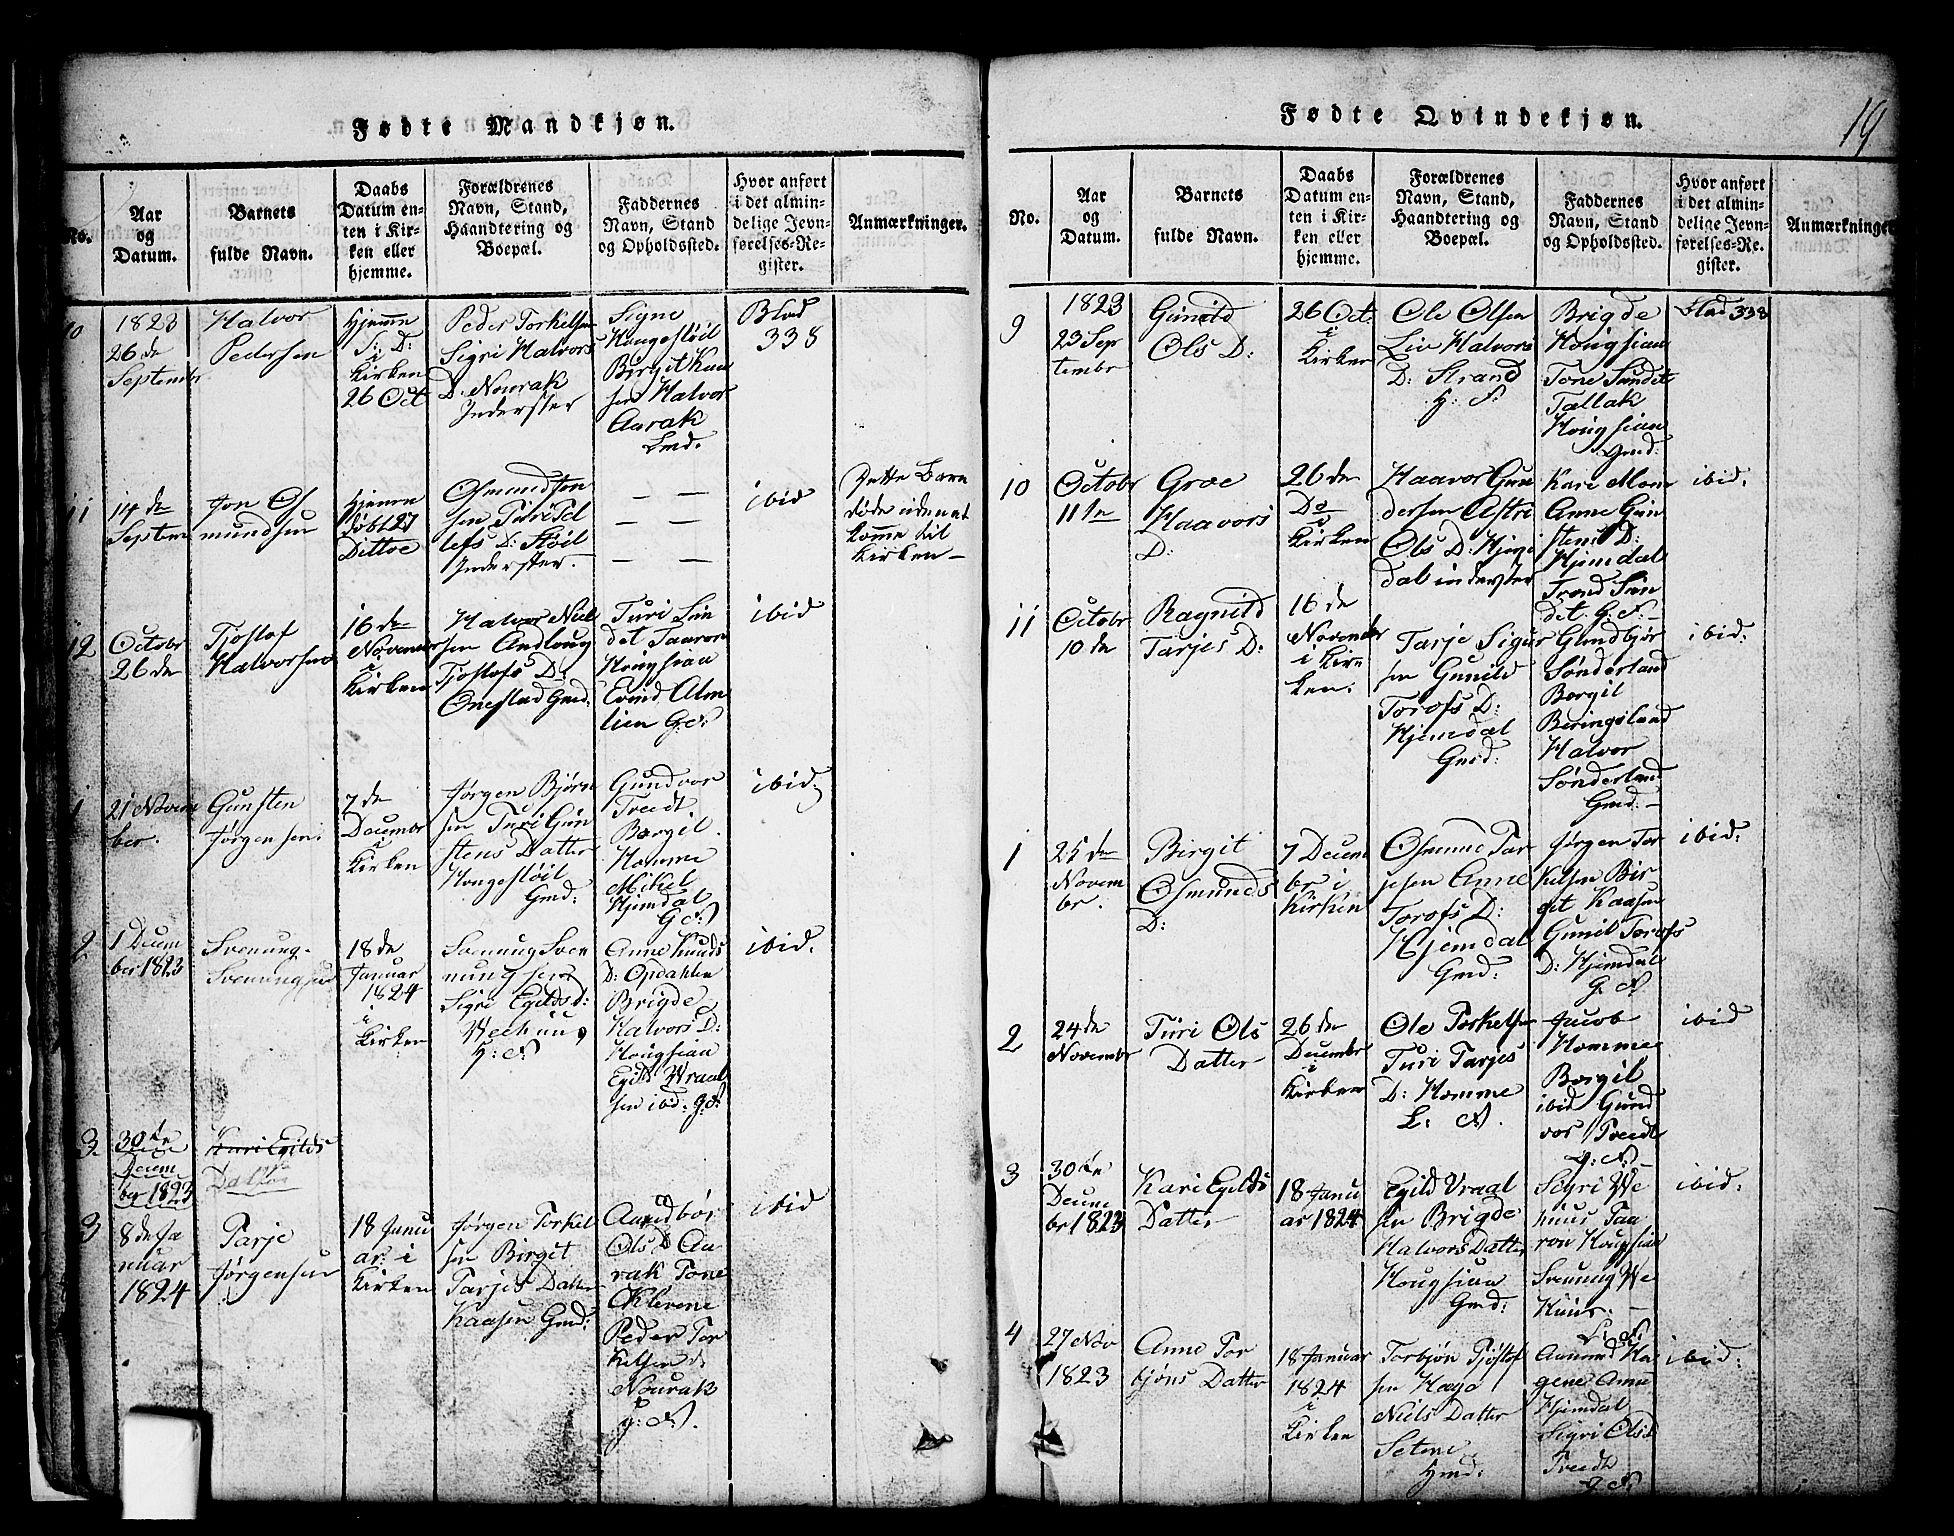 SAKO, Nissedal kirkebøker, G/Gb/L0001: Klokkerbok nr. II 1, 1814-1862, s. 19